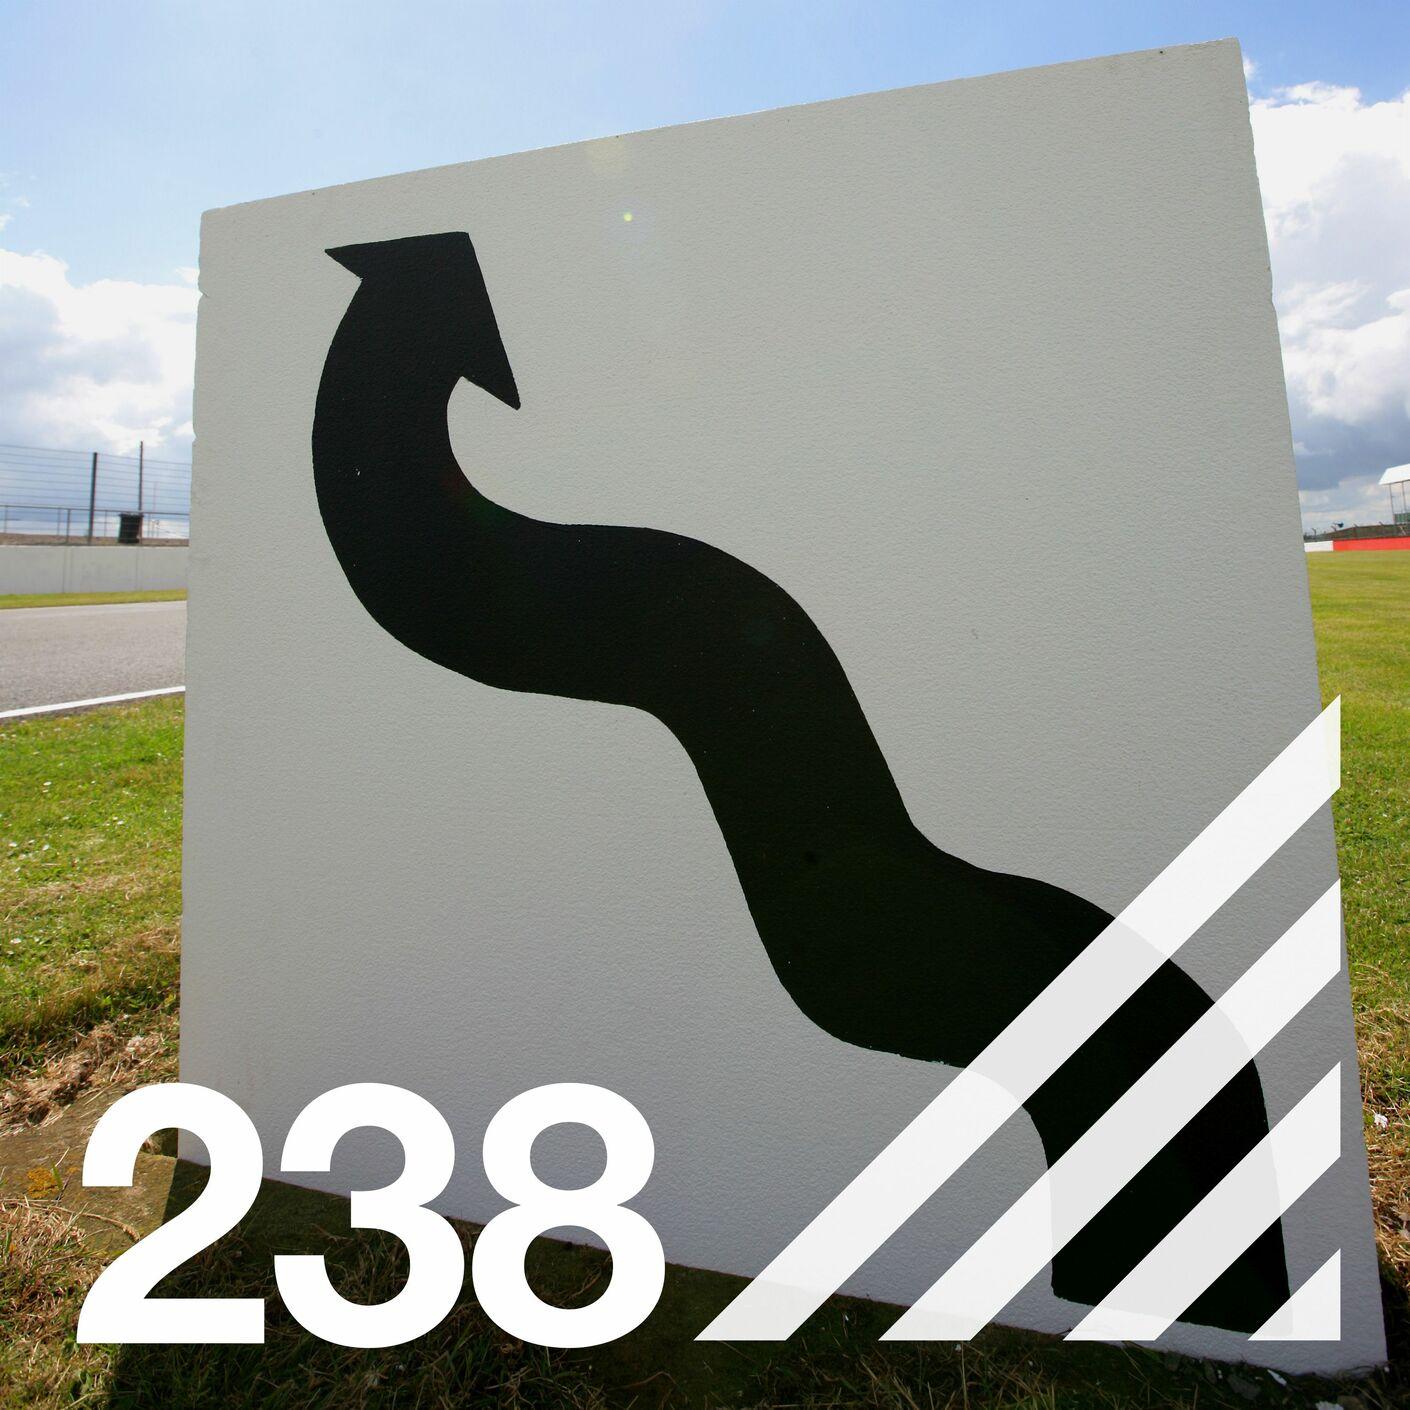 238. Sim(m)a lugnt